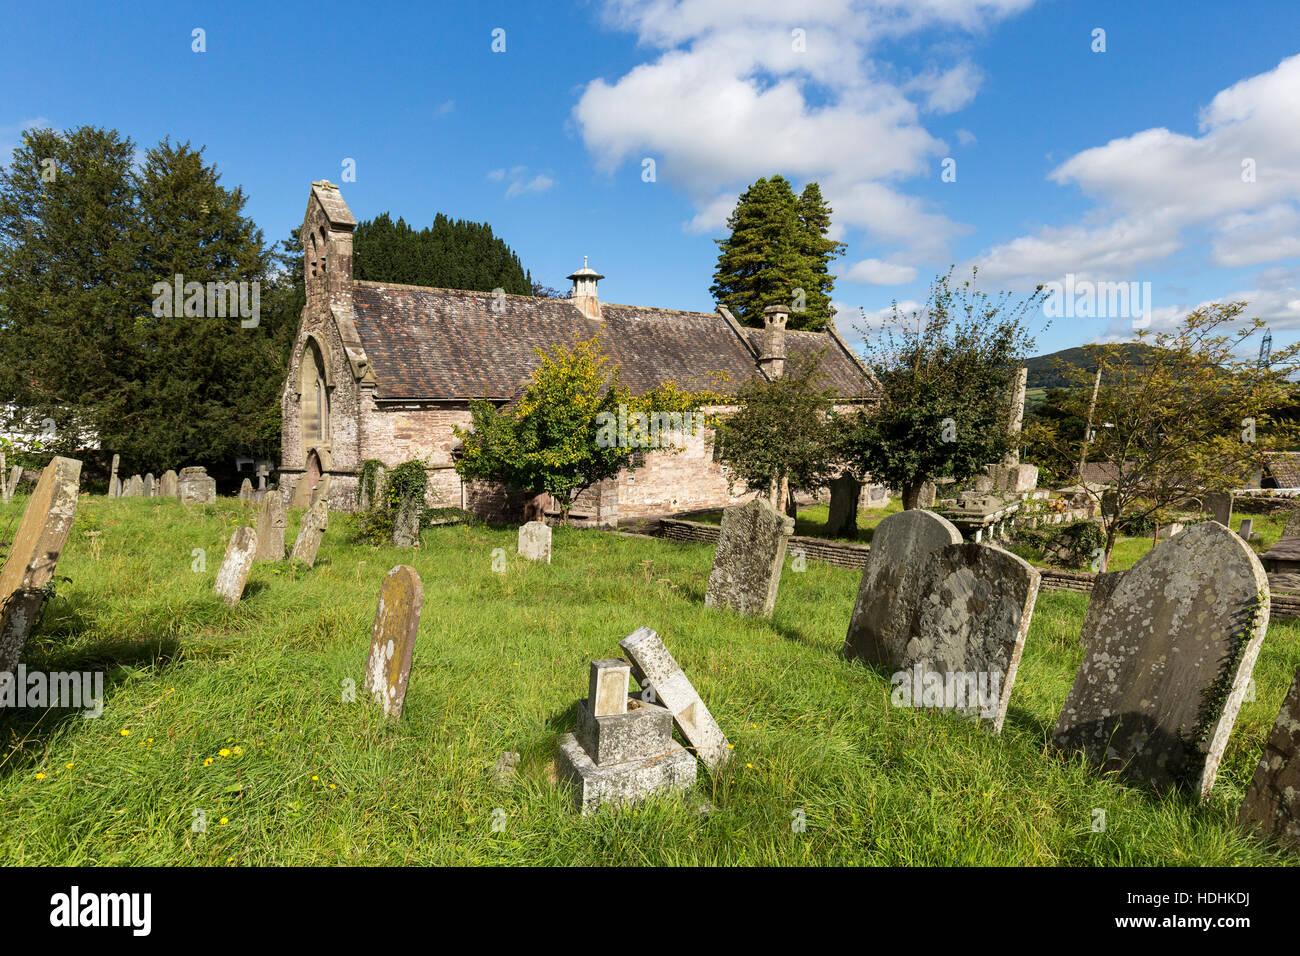 Churchyard with leaning gravestones, Llanfoist, Wales, UK - Stock Image